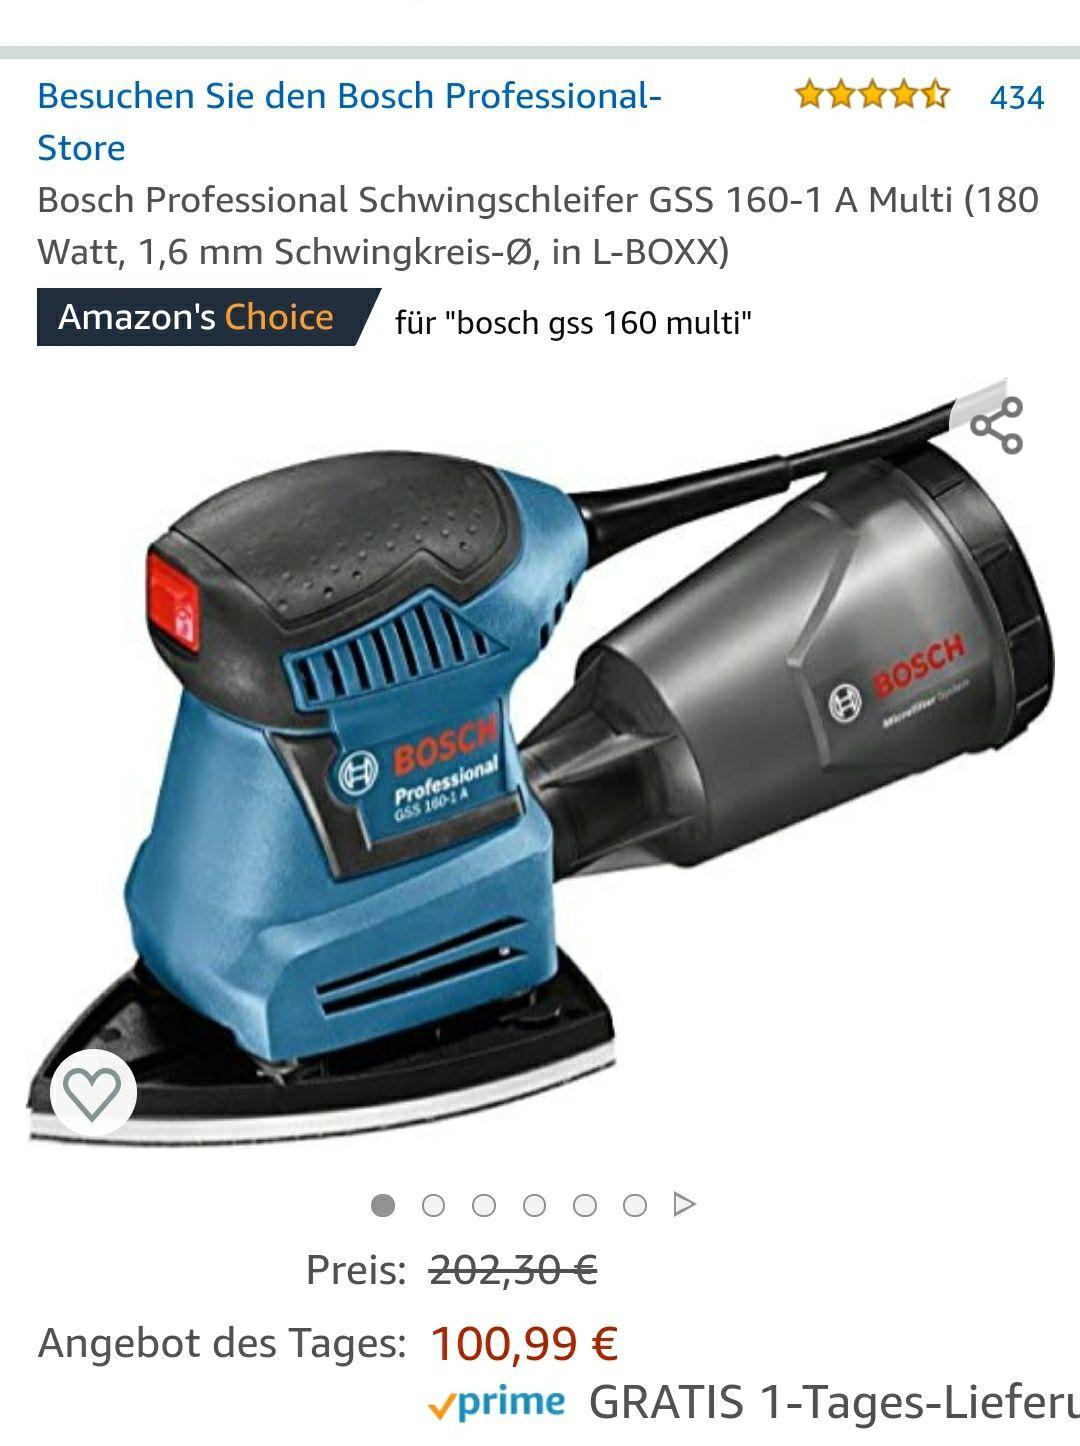 Bosch Professional Schwingschleifer GSS 160-1 A Multi